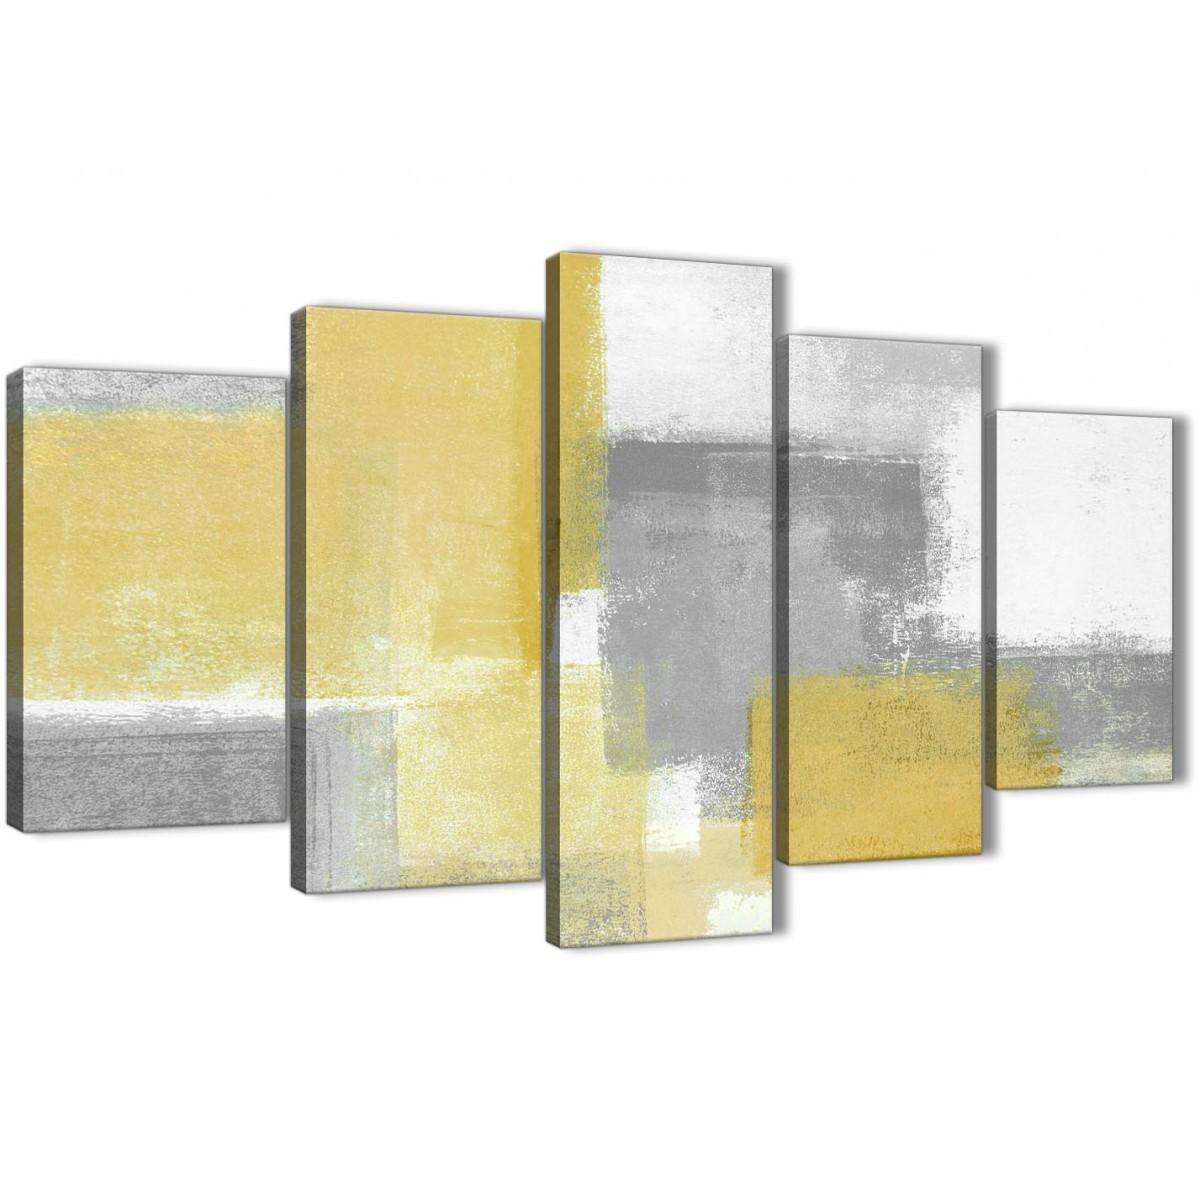 Bedroom Canvas Wall Art Uk: 5 Piece Mustard Yellow Grey Abstract Living Room Canvas